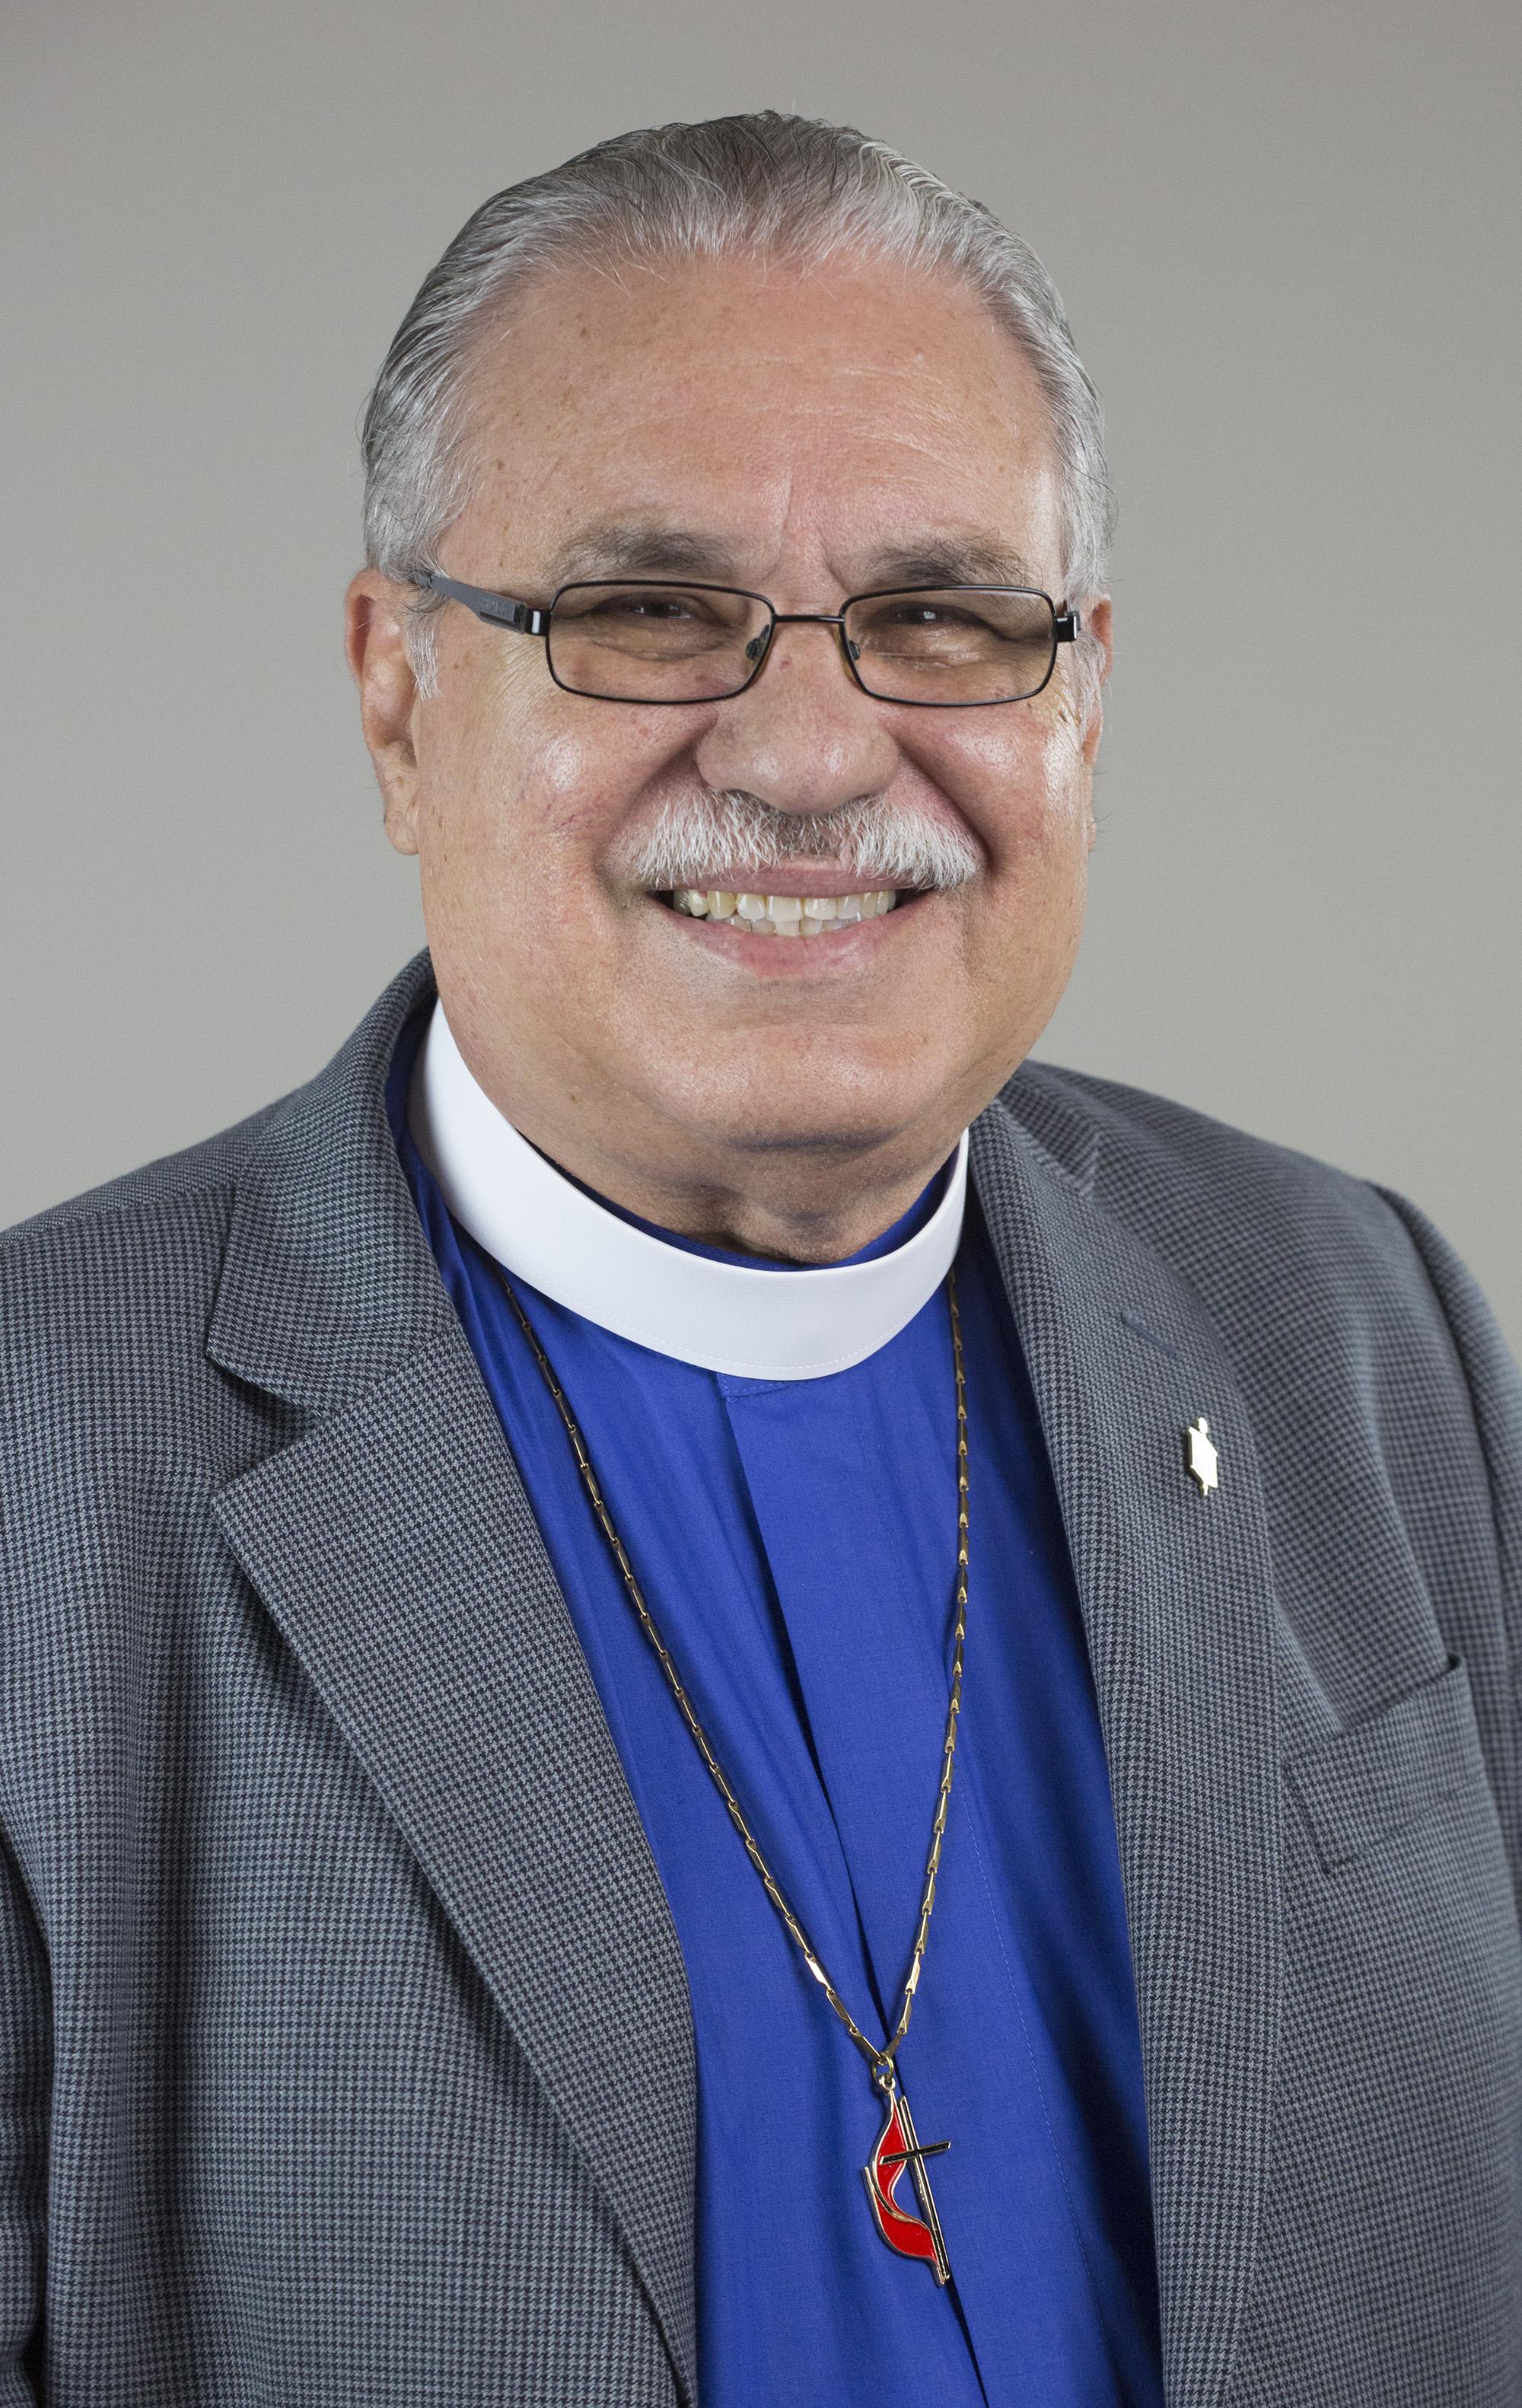 Rev. Hector Ortiz, obispo de la Iglesia Metodista de Puerto Rico. Foto Kathleen Barry, Noticias MU.